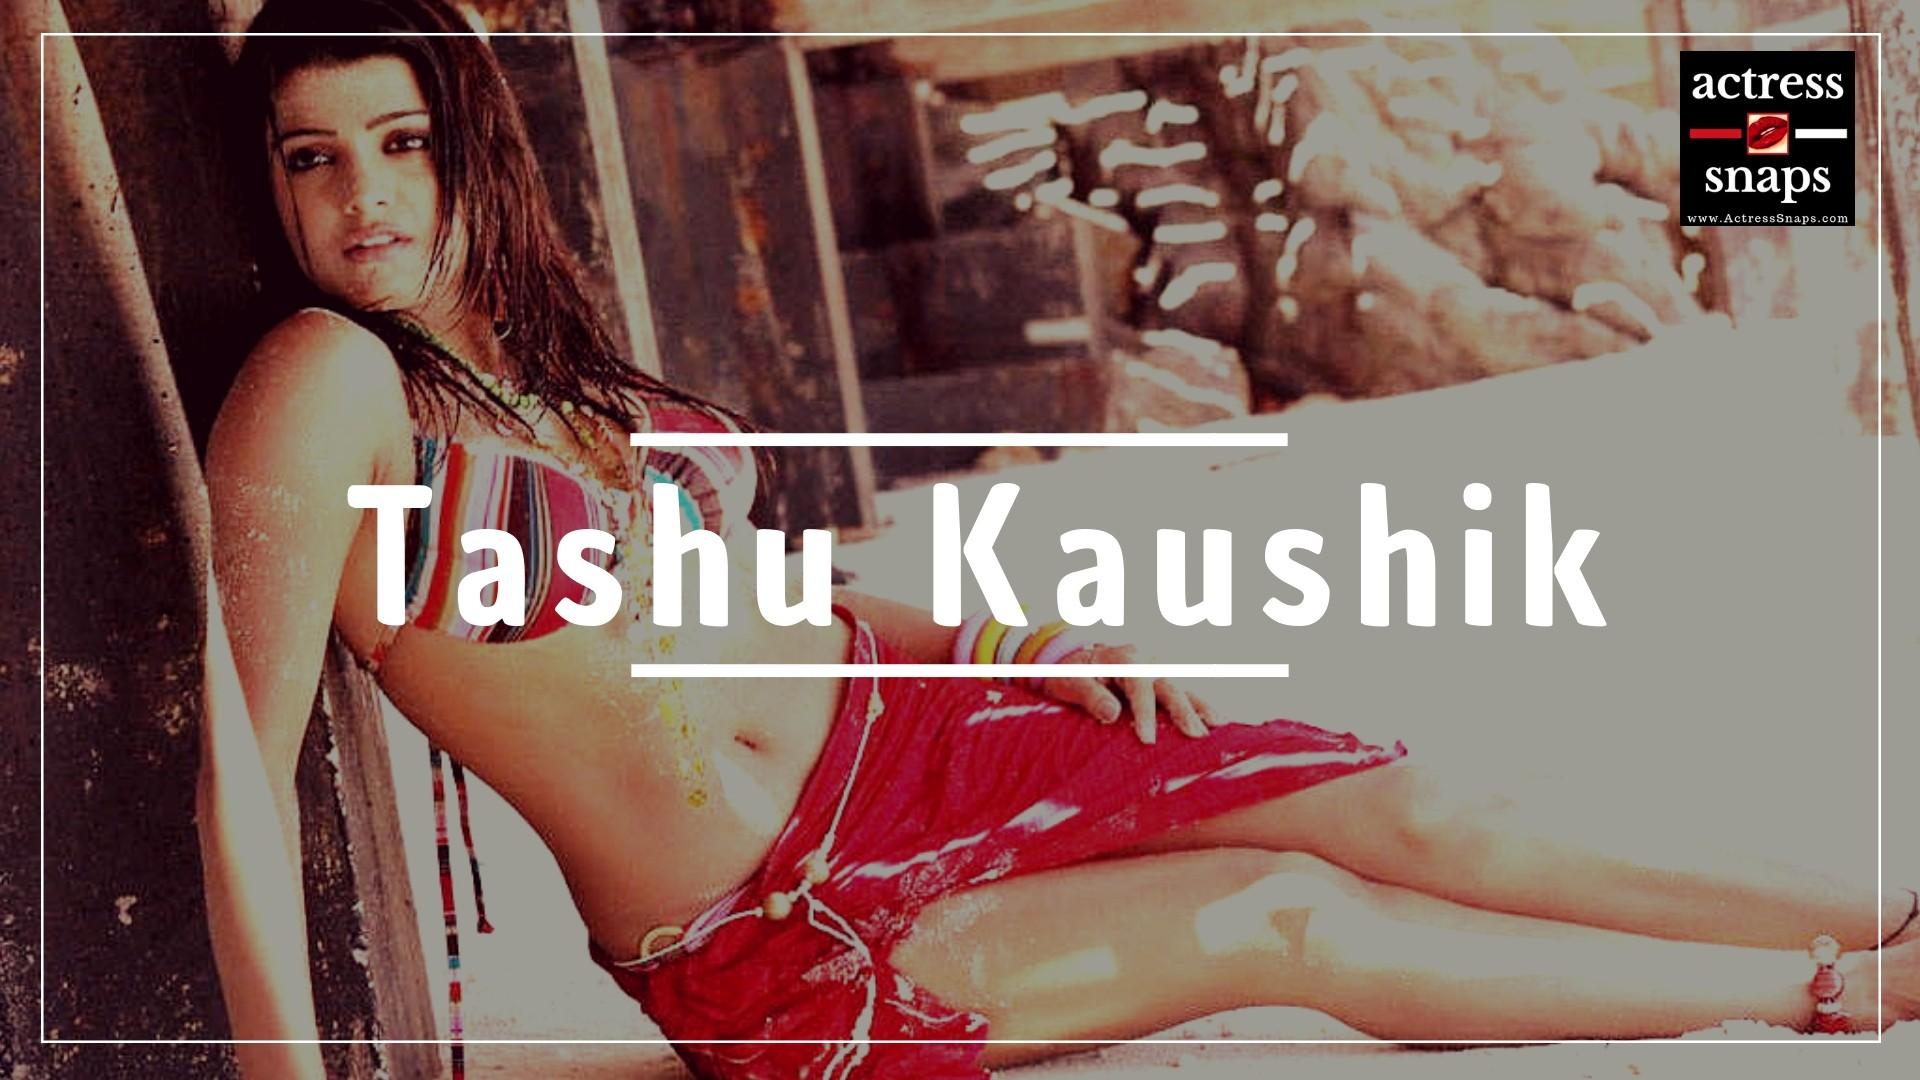 Tashu Kaushik in Sexy Bikini - Sexy Actress Pictures | Hot Actress Pictures - ActressSnaps.com